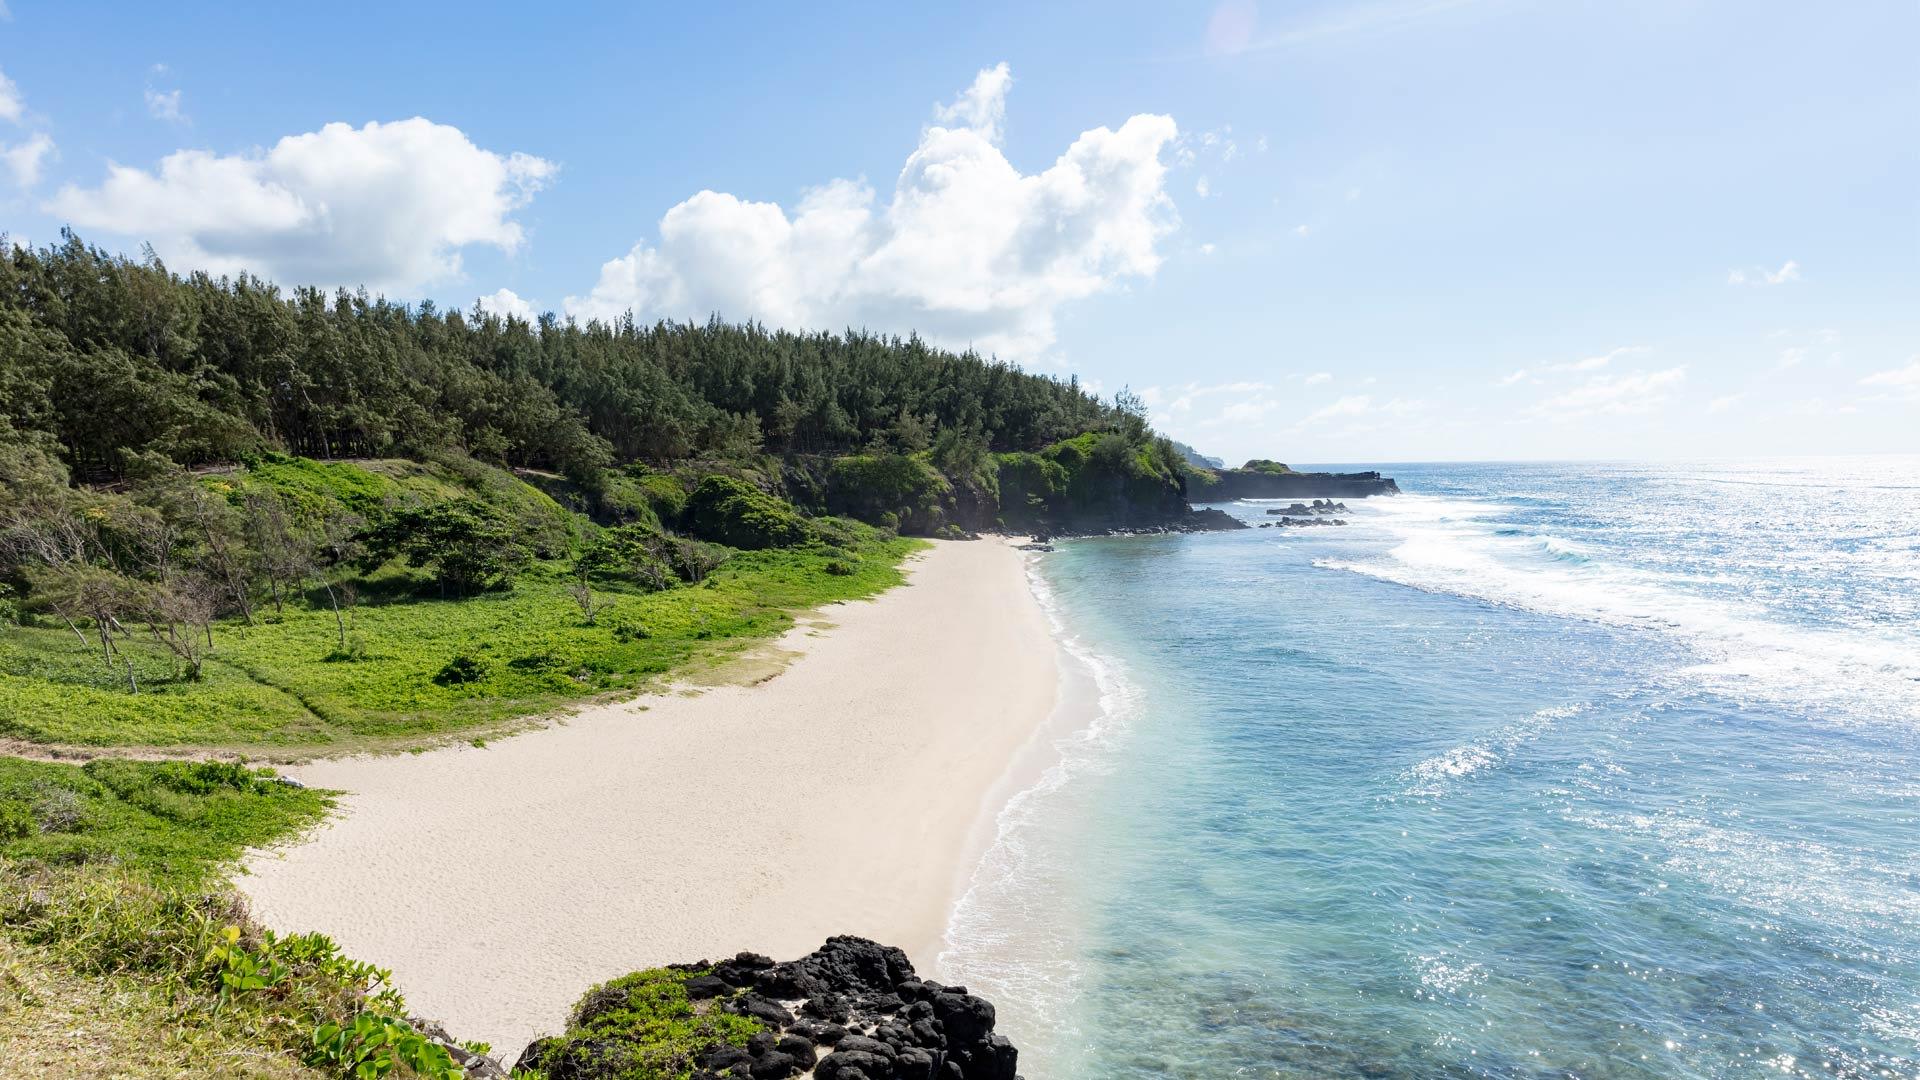 https://assets.anantara.com/image/upload/q_auto,f_auto/media/minor/anantara/images/anantara-iko-mauritius/destination/anantara_iko_mauritius_beach_1920x1080.jpg